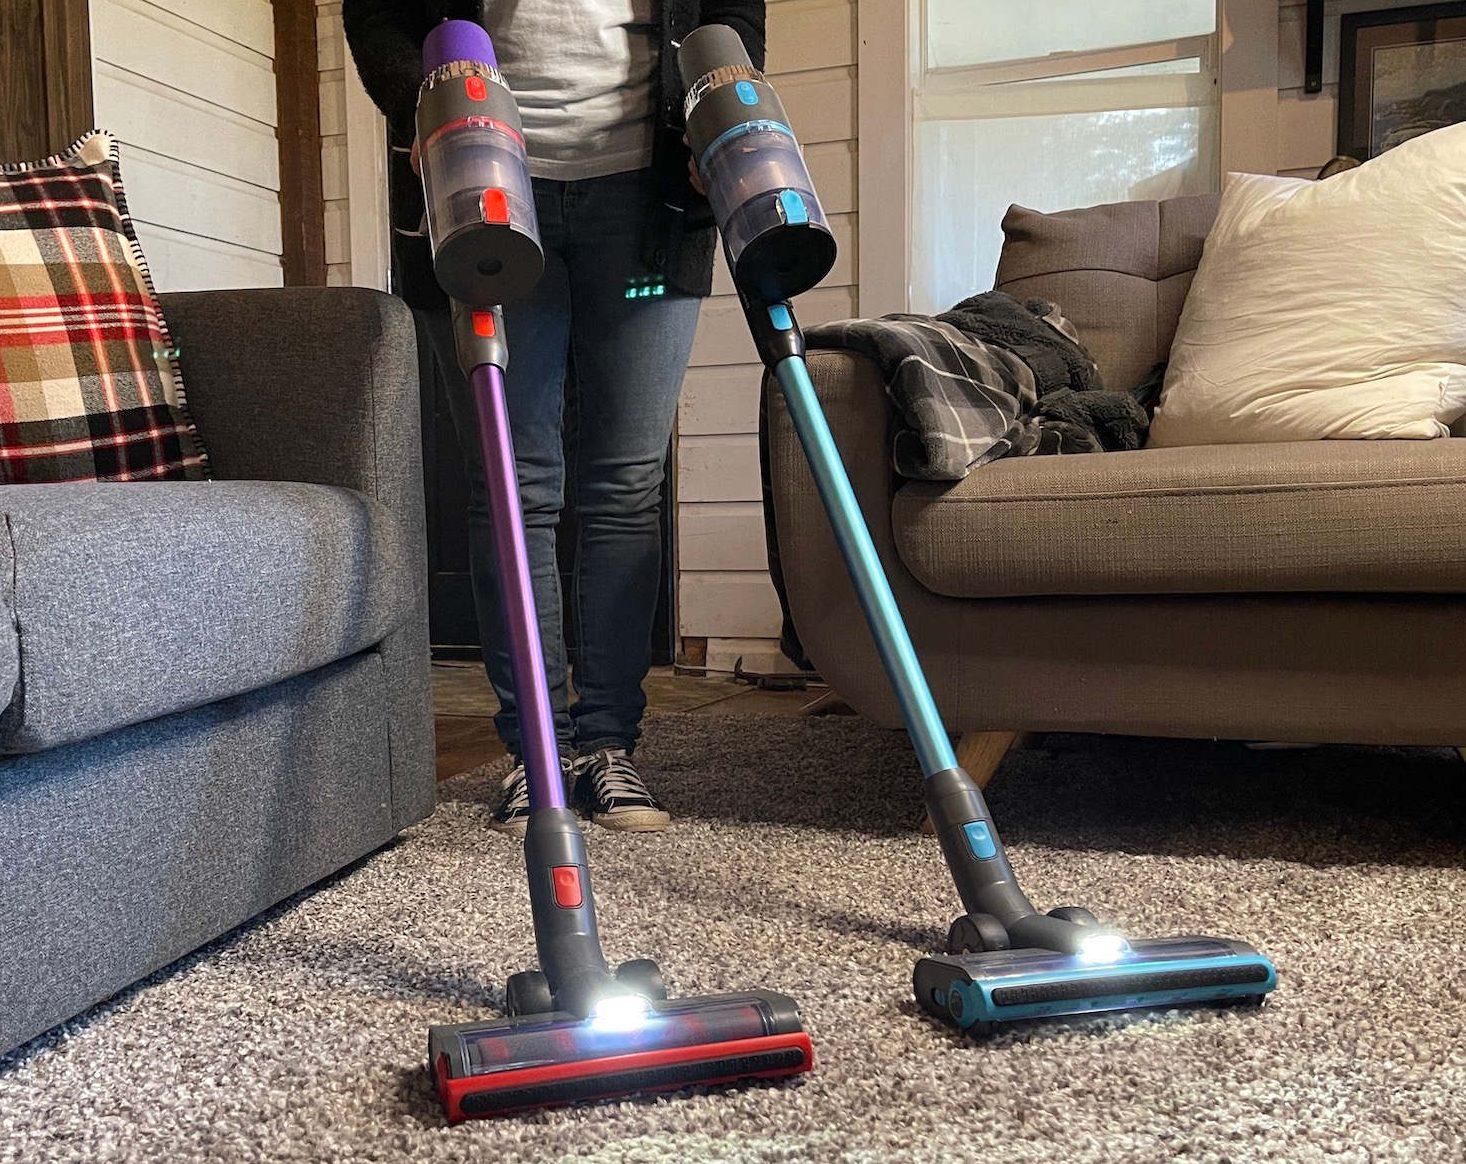 ASHEN Stick Vacuum V18 and V16 review